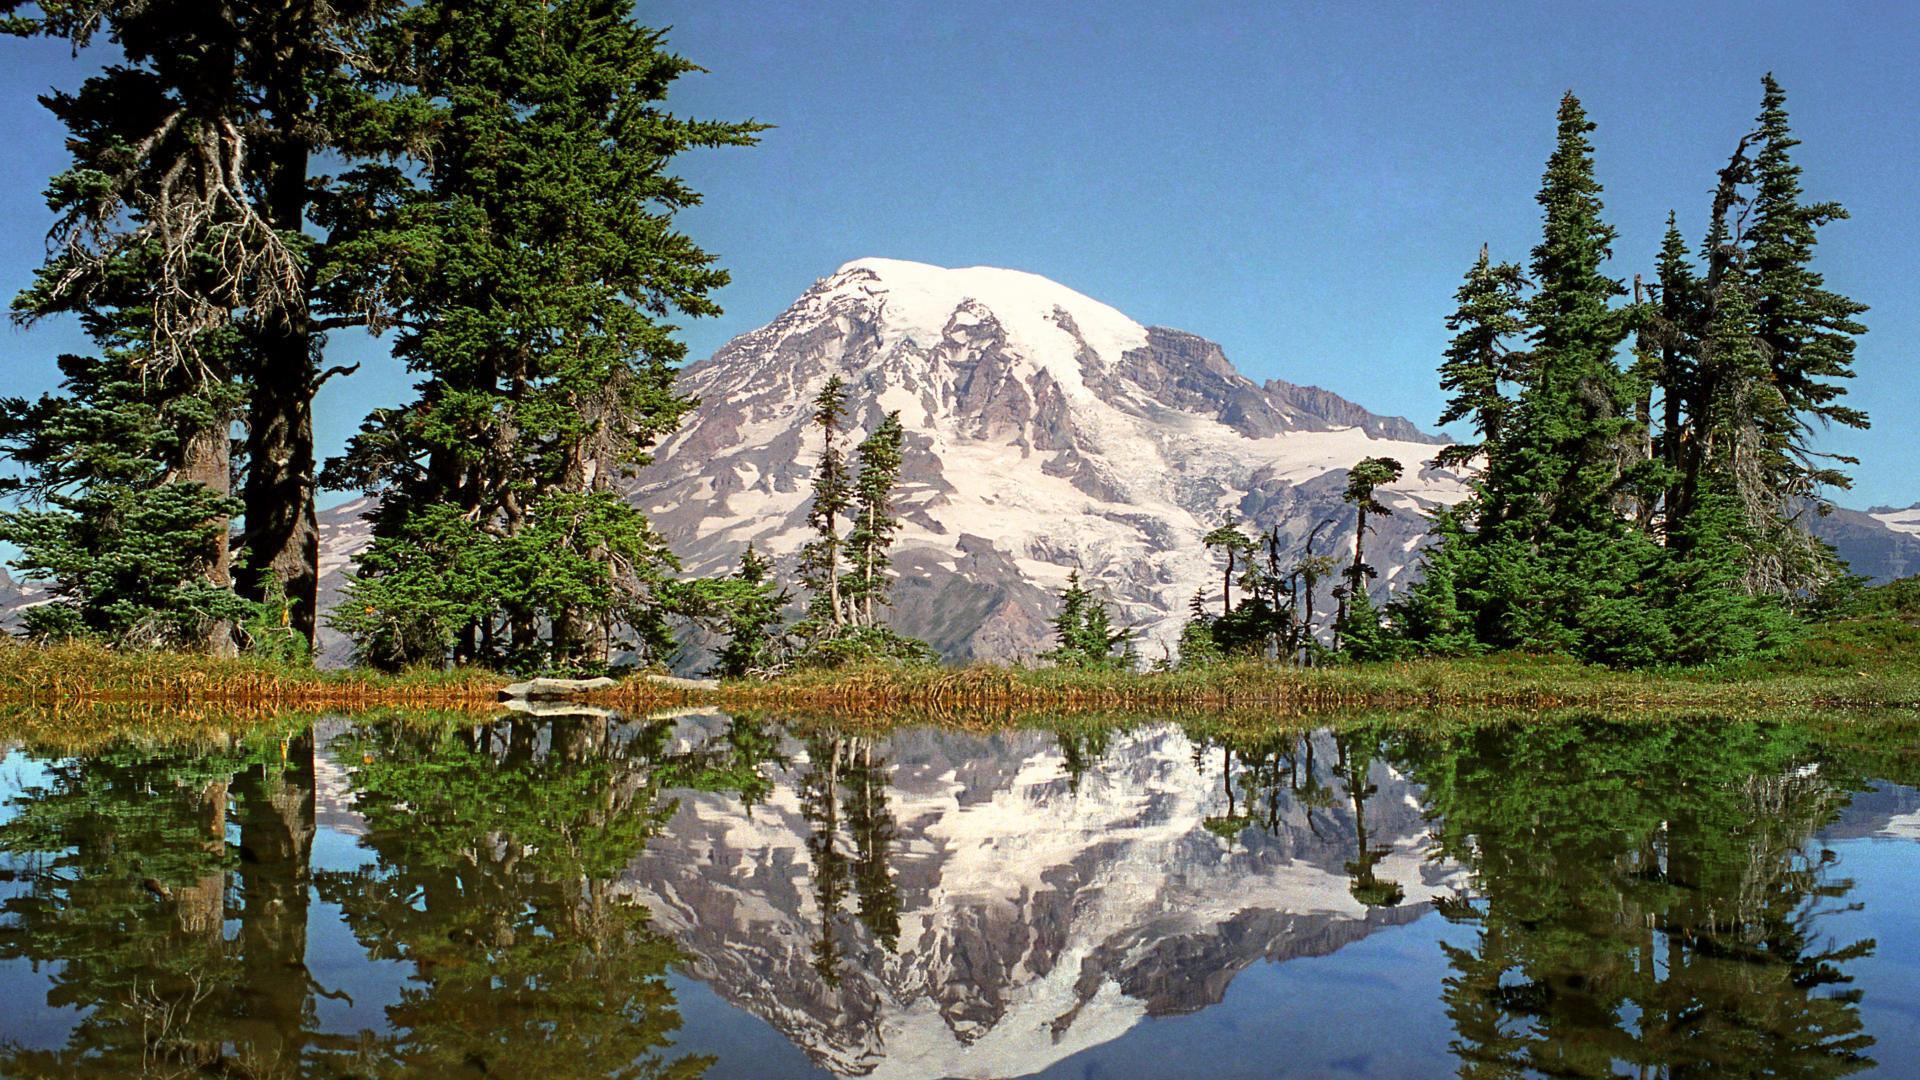 Wallpaper mount rainier national park mount rainier lake reflection 1920x1080